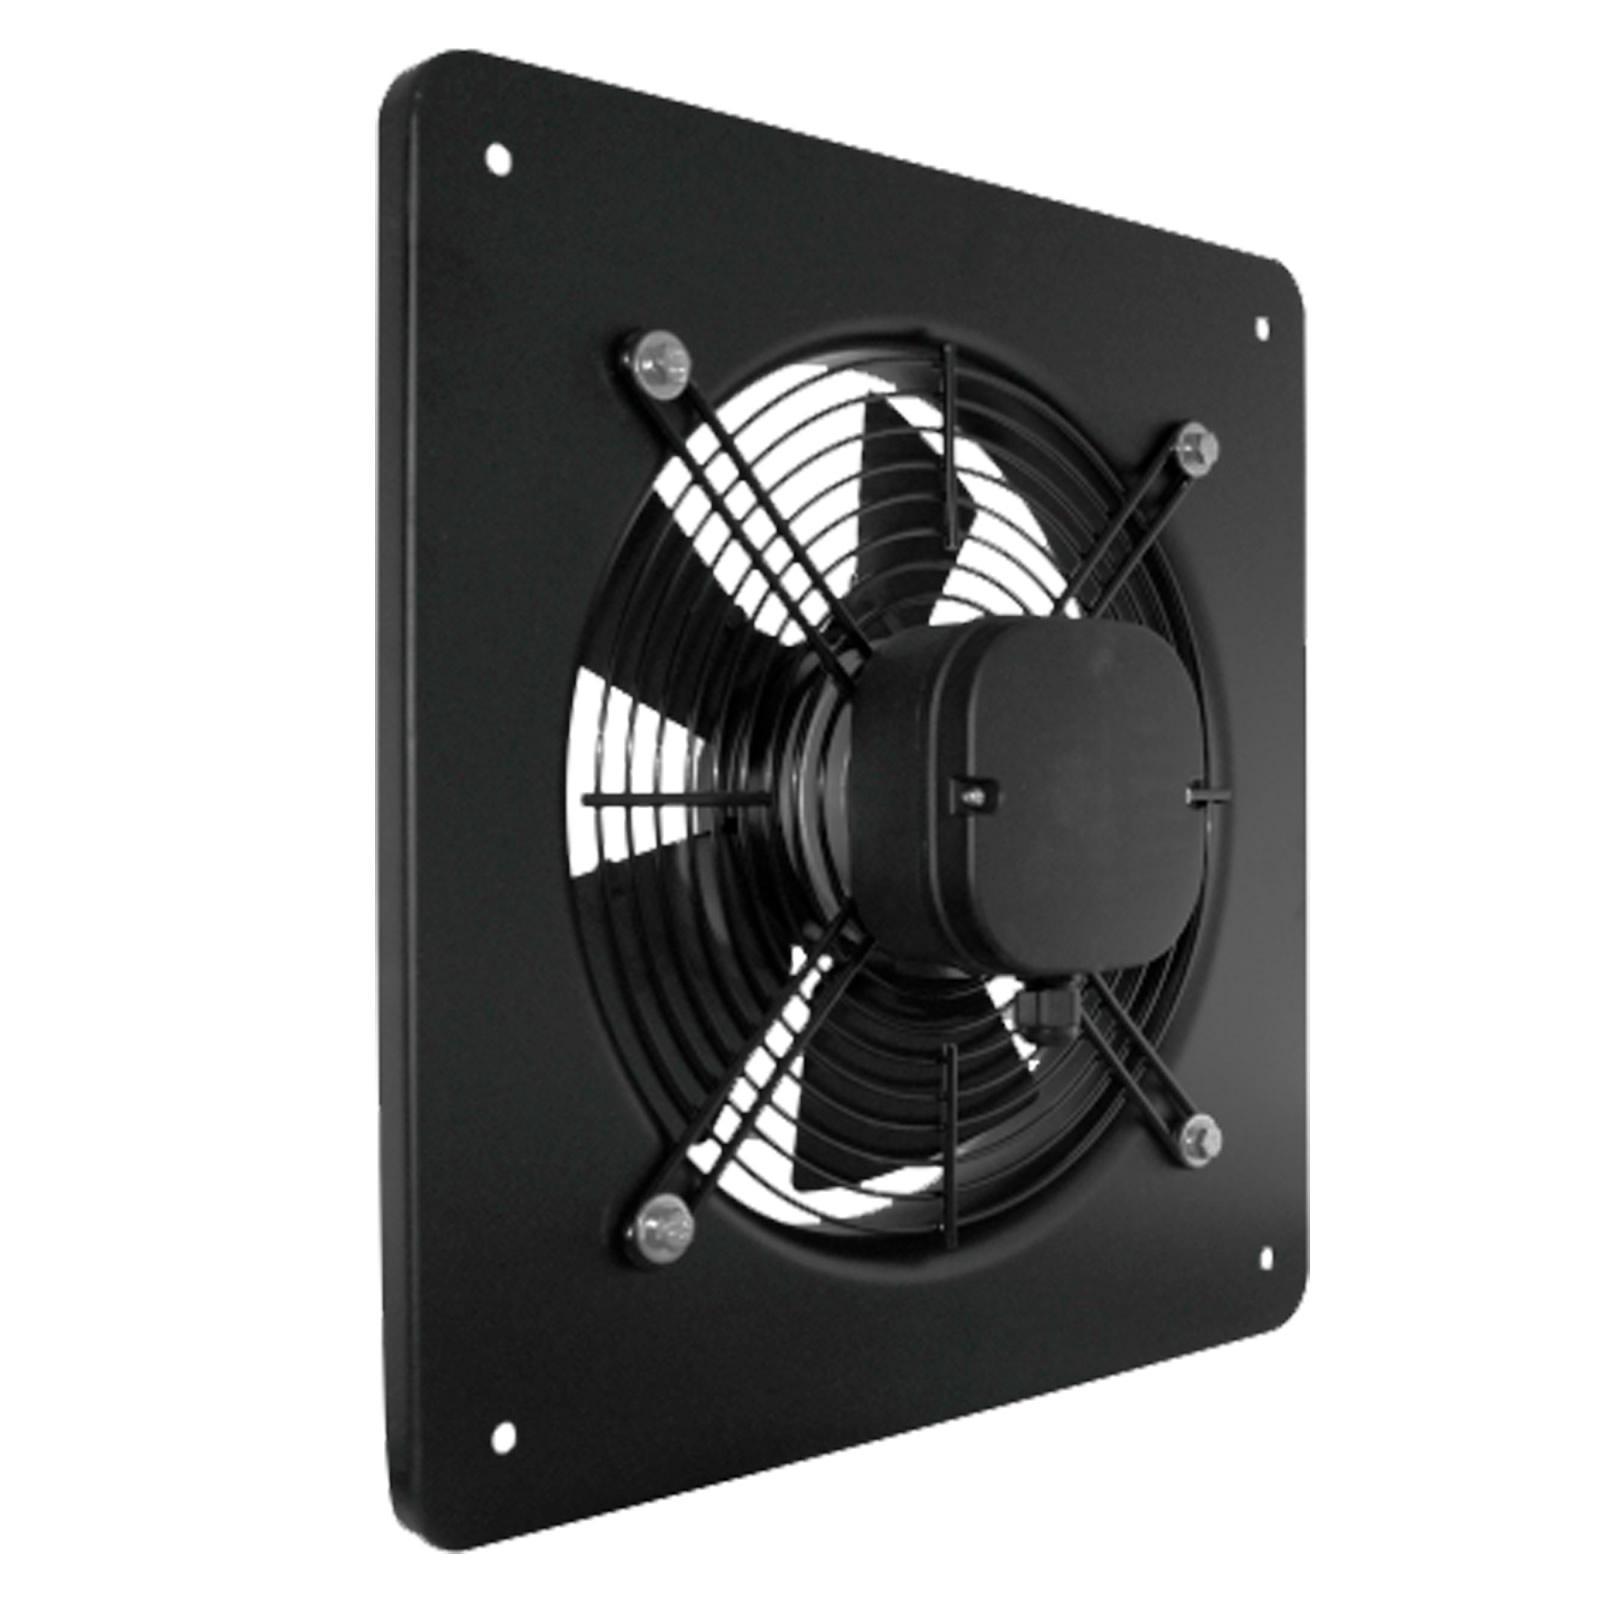 Вентилятор Era Storm ywf4e 400 все цены